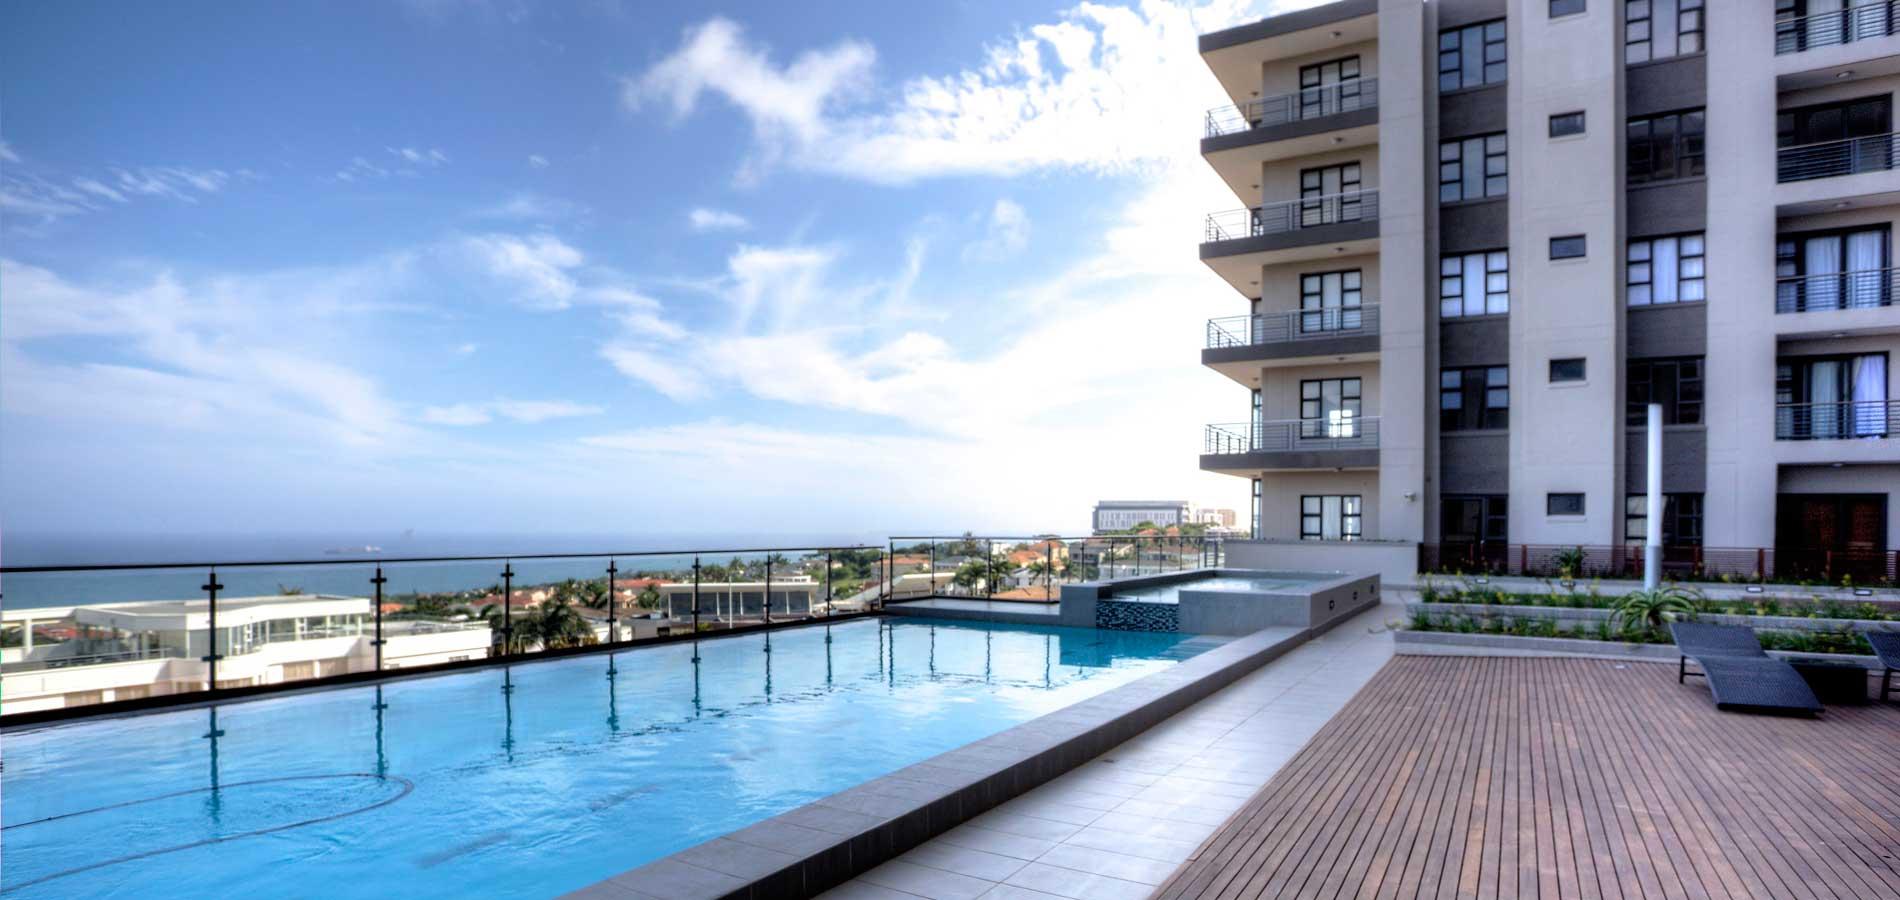 jossi interior design durban-interior-decorator-hotel-design-retail-design-corporate-design-hospitality-design-kzn-south-africa-herwood